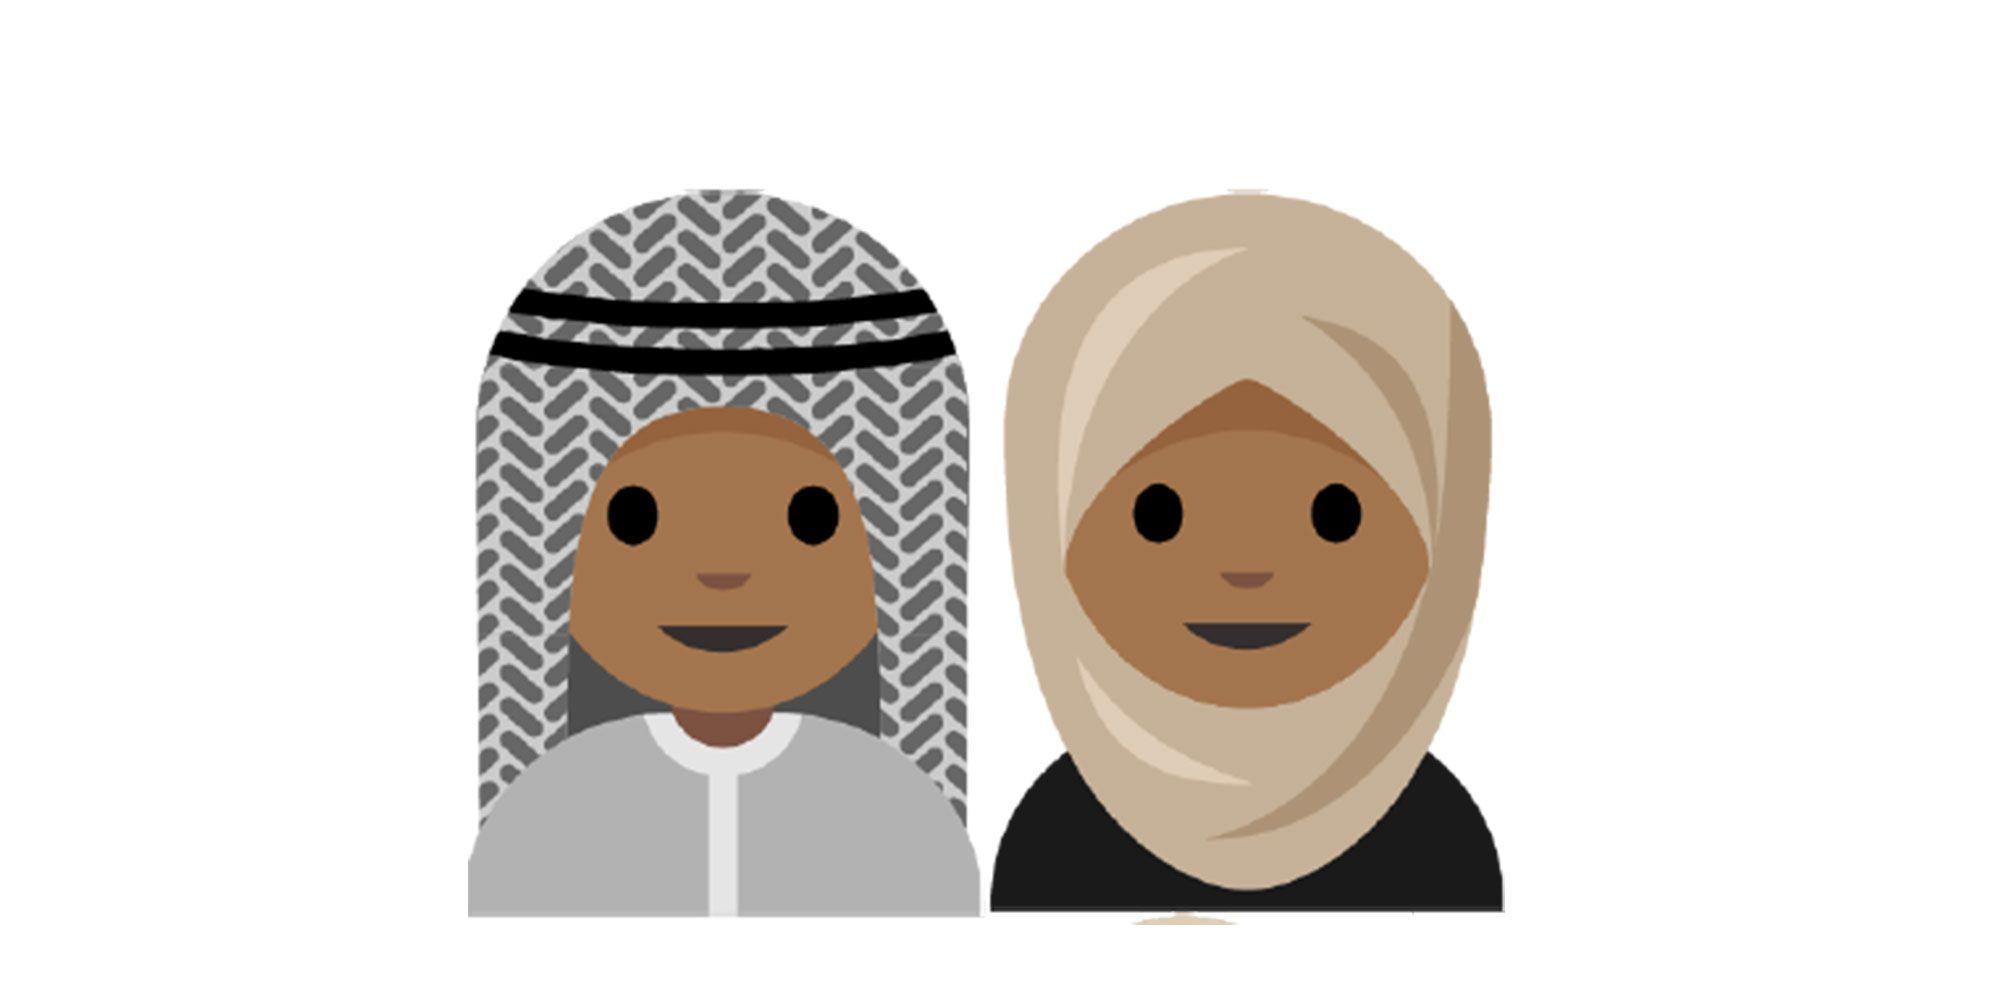 Hijabs, Breastfeeding, Non-Binary Genders: The New Emojis Coming In 2017